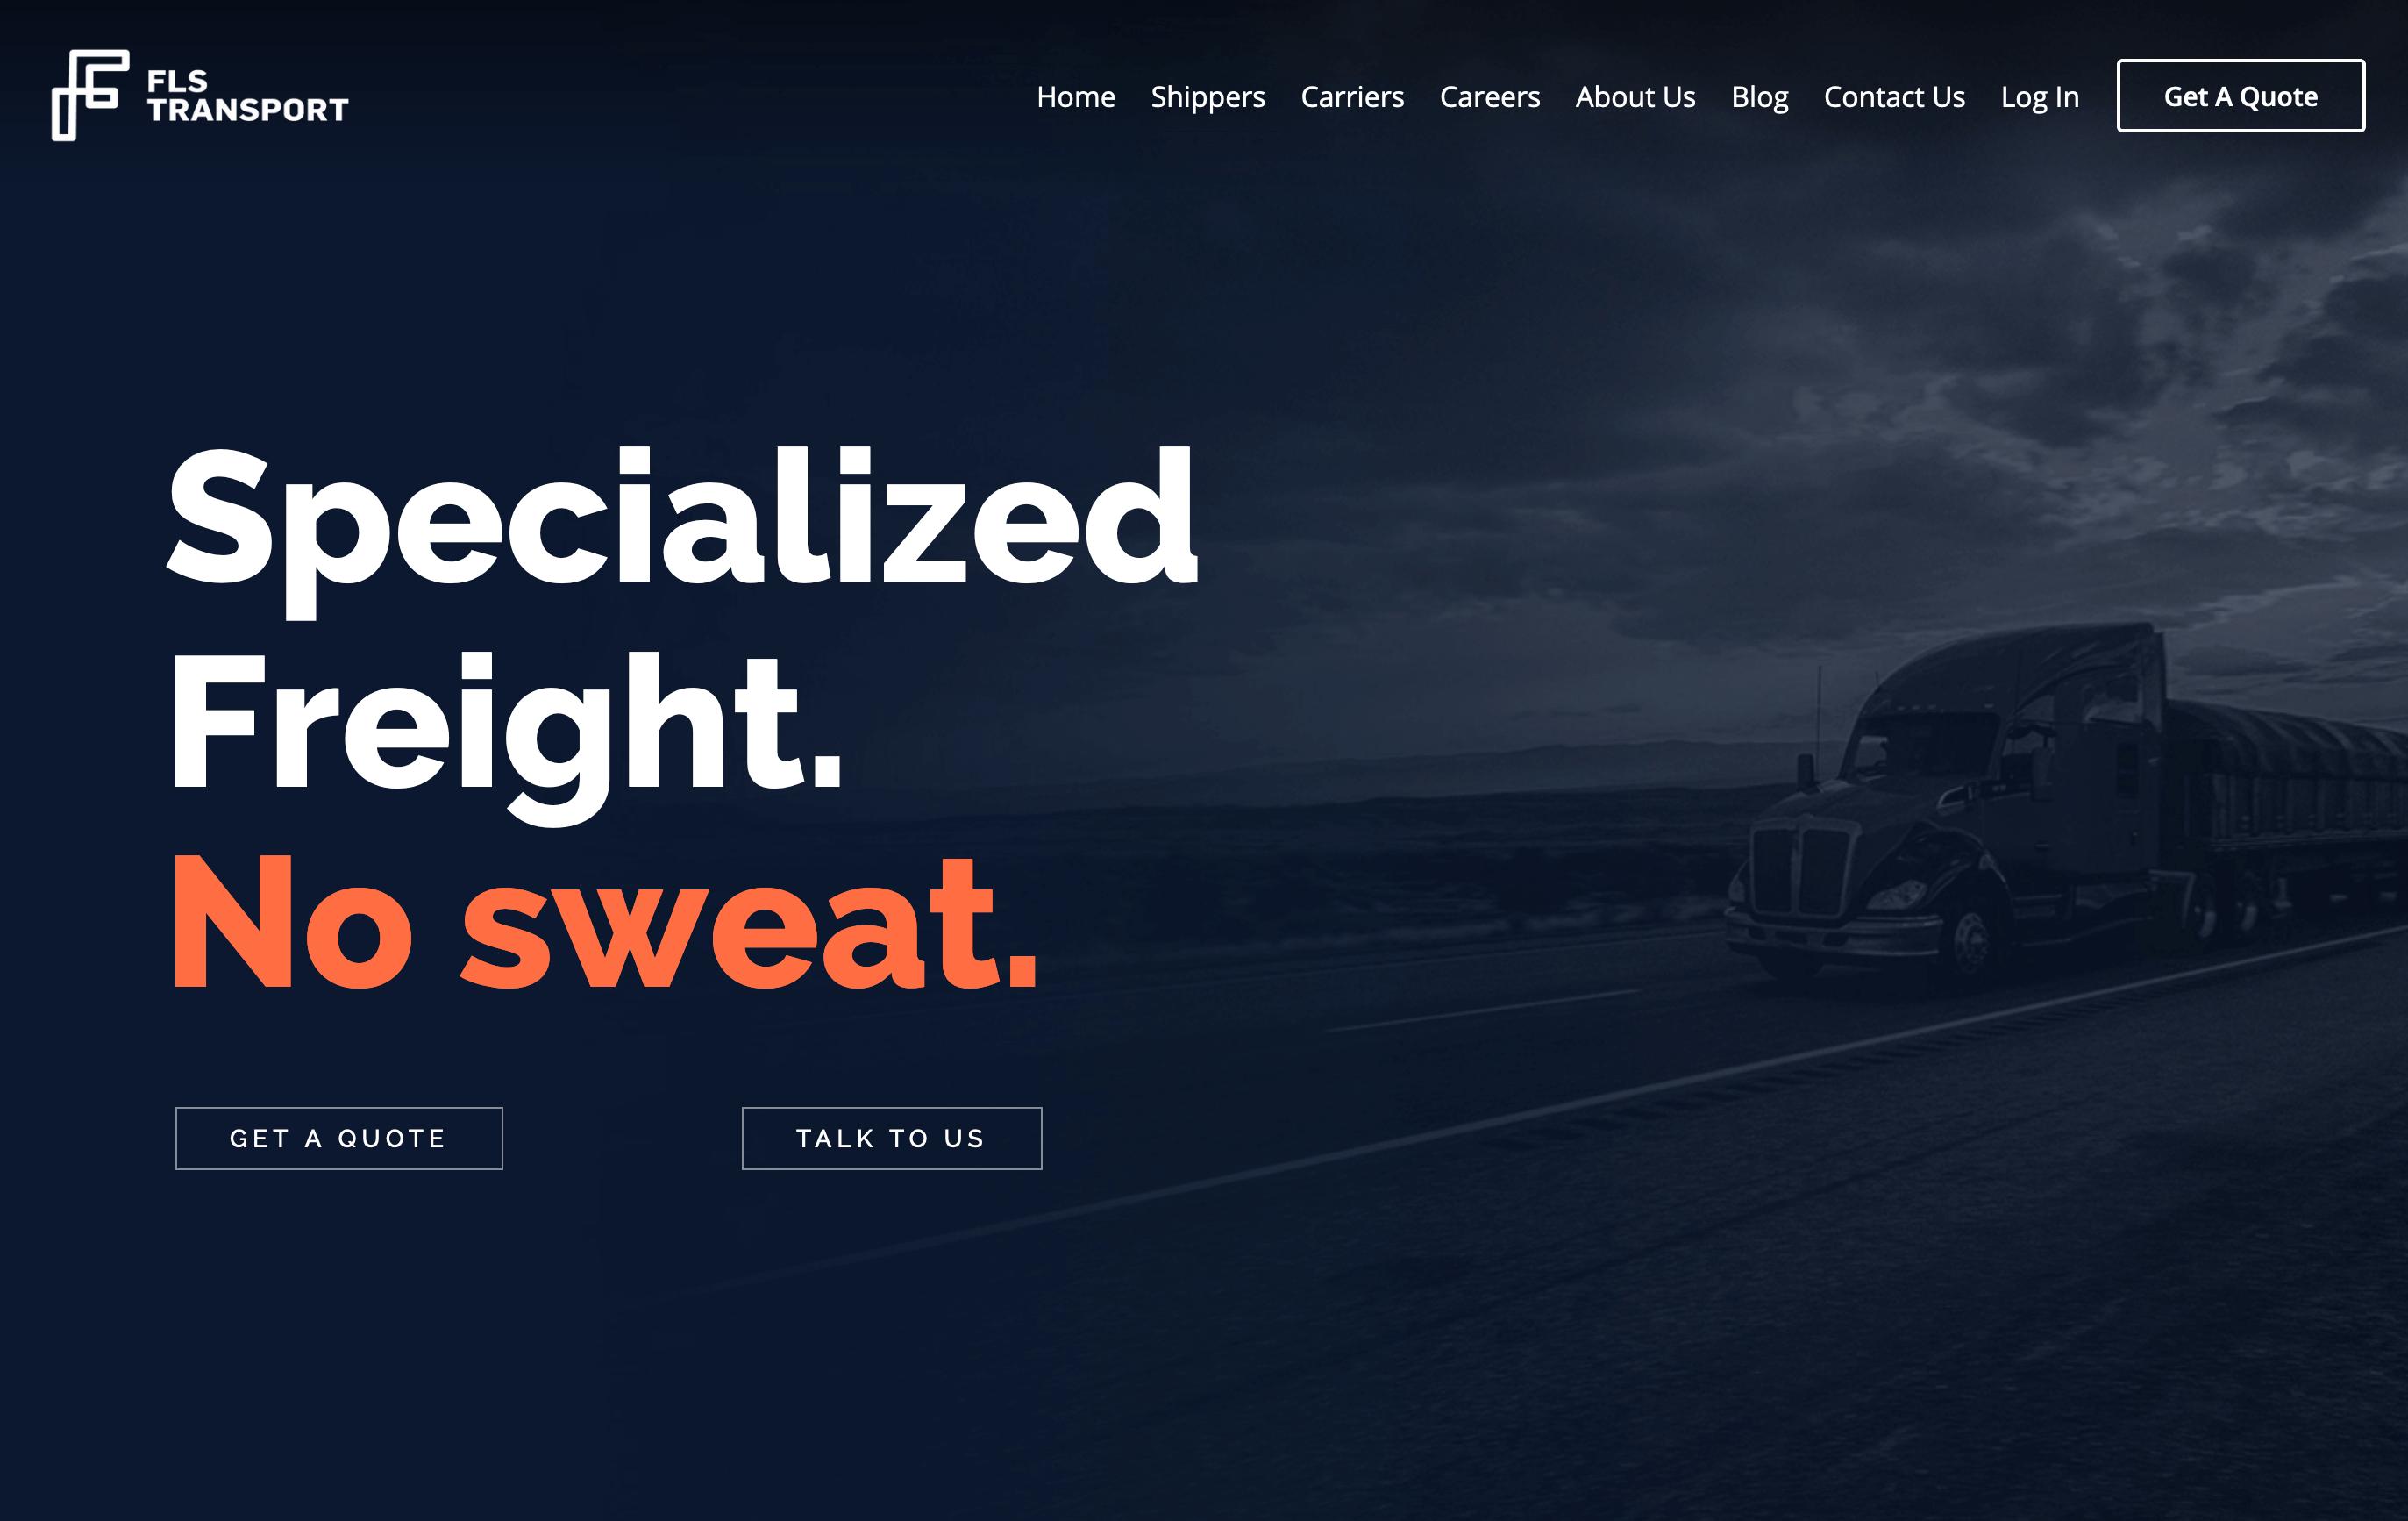 FLS Transport Typography